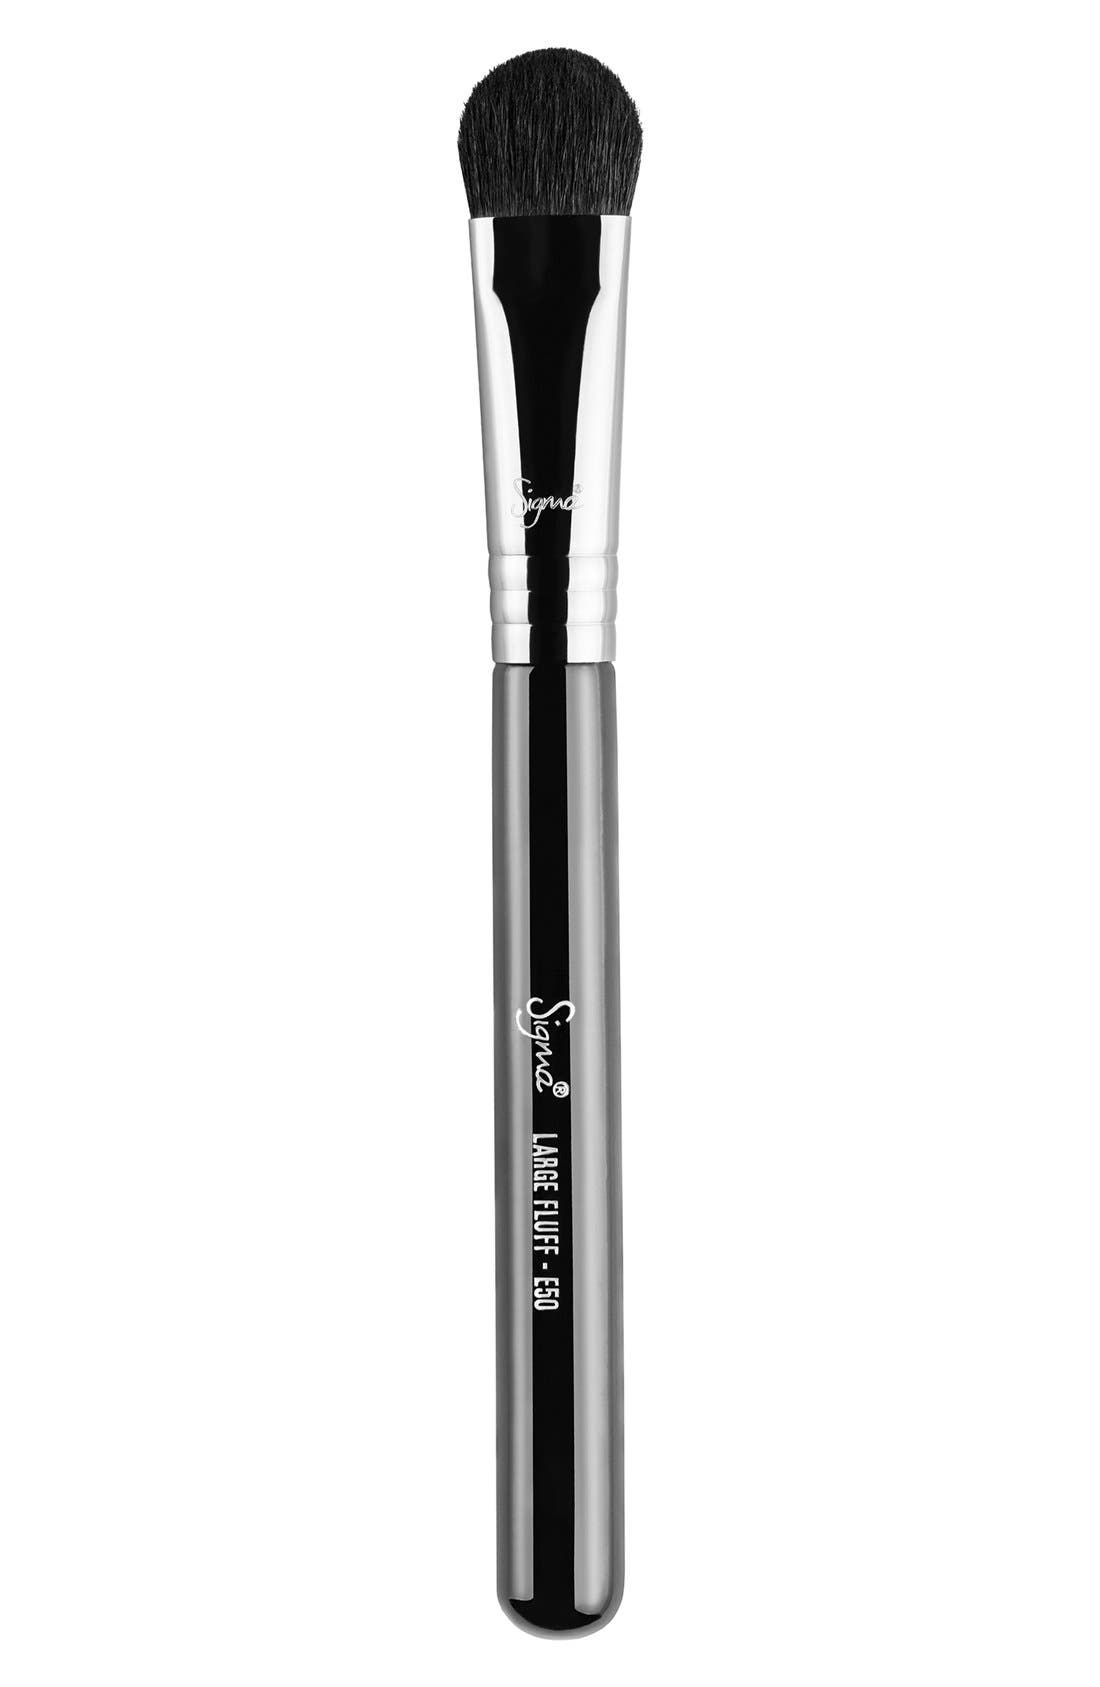 E50 Large Fluff Brush,                             Main thumbnail 1, color,                             NO COLOR